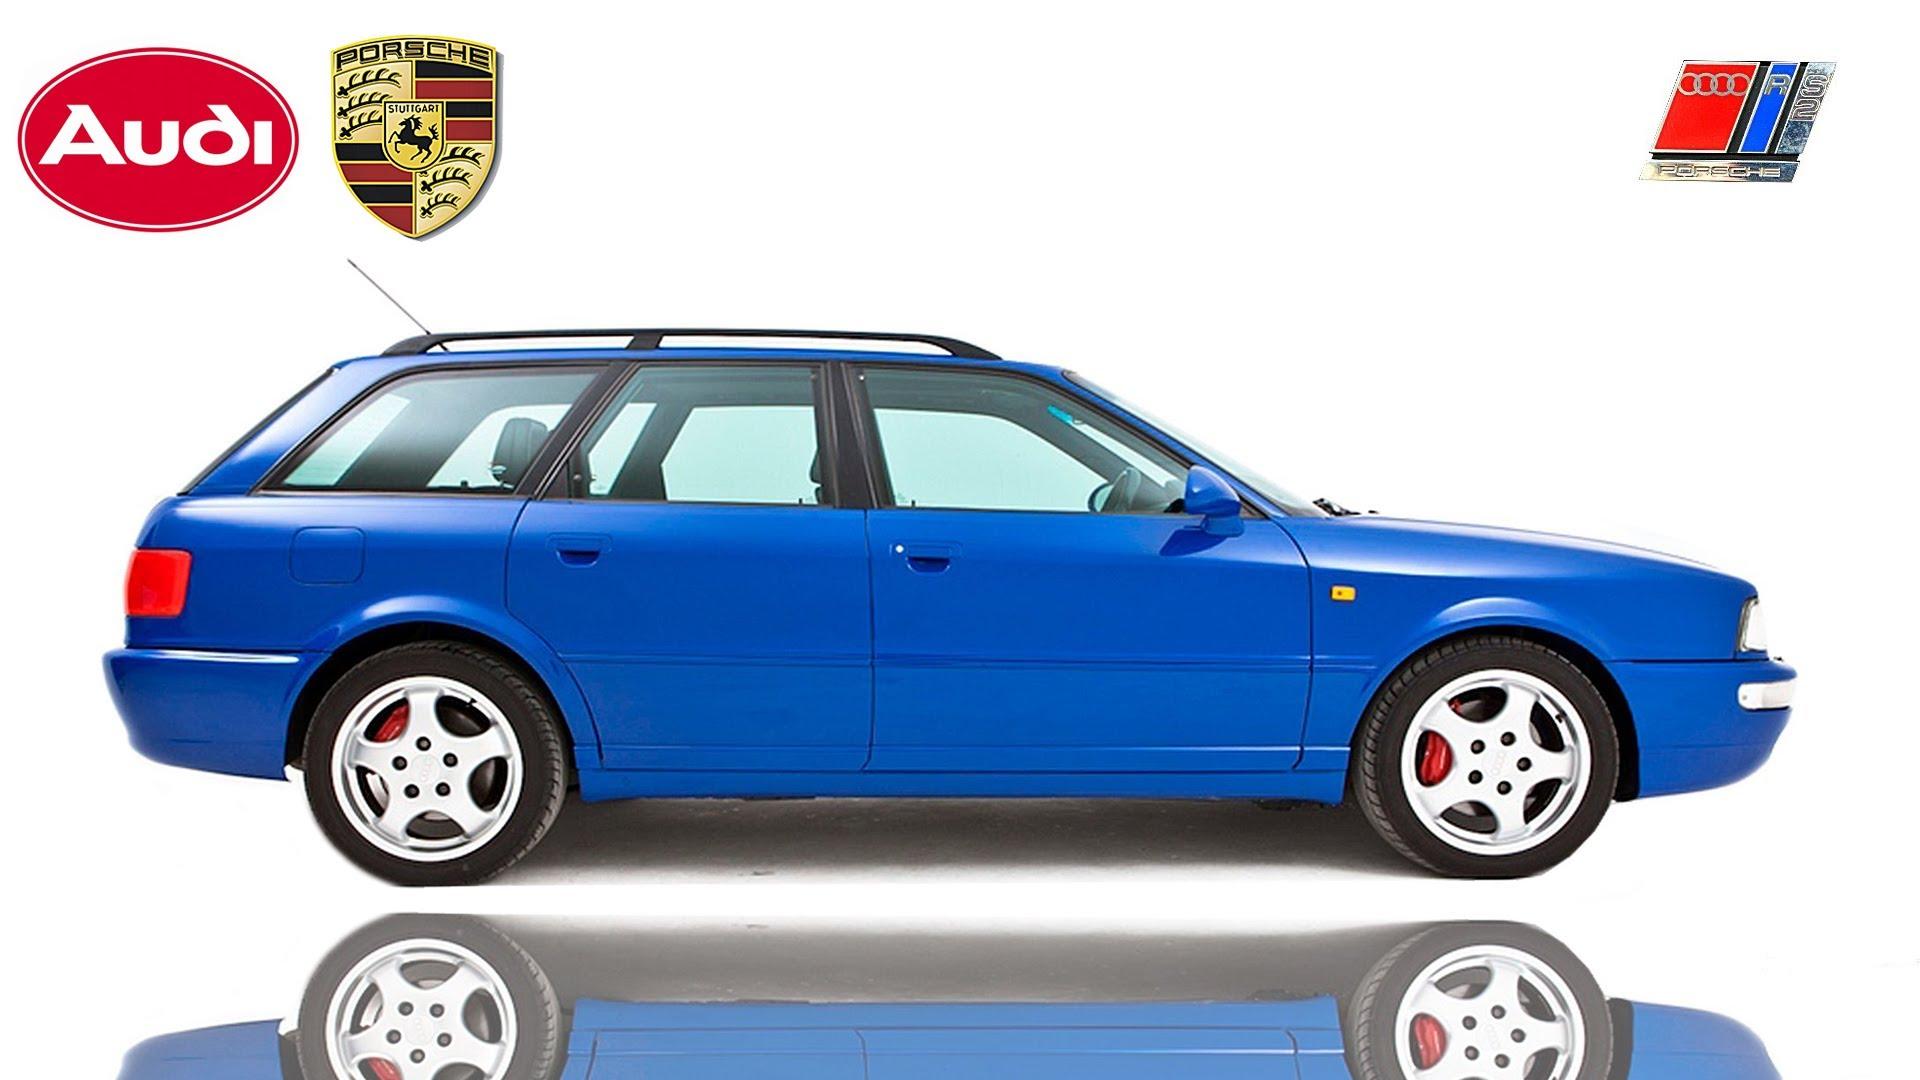 Audi S2 I 1990 - 1995 Station wagon 5 door #1